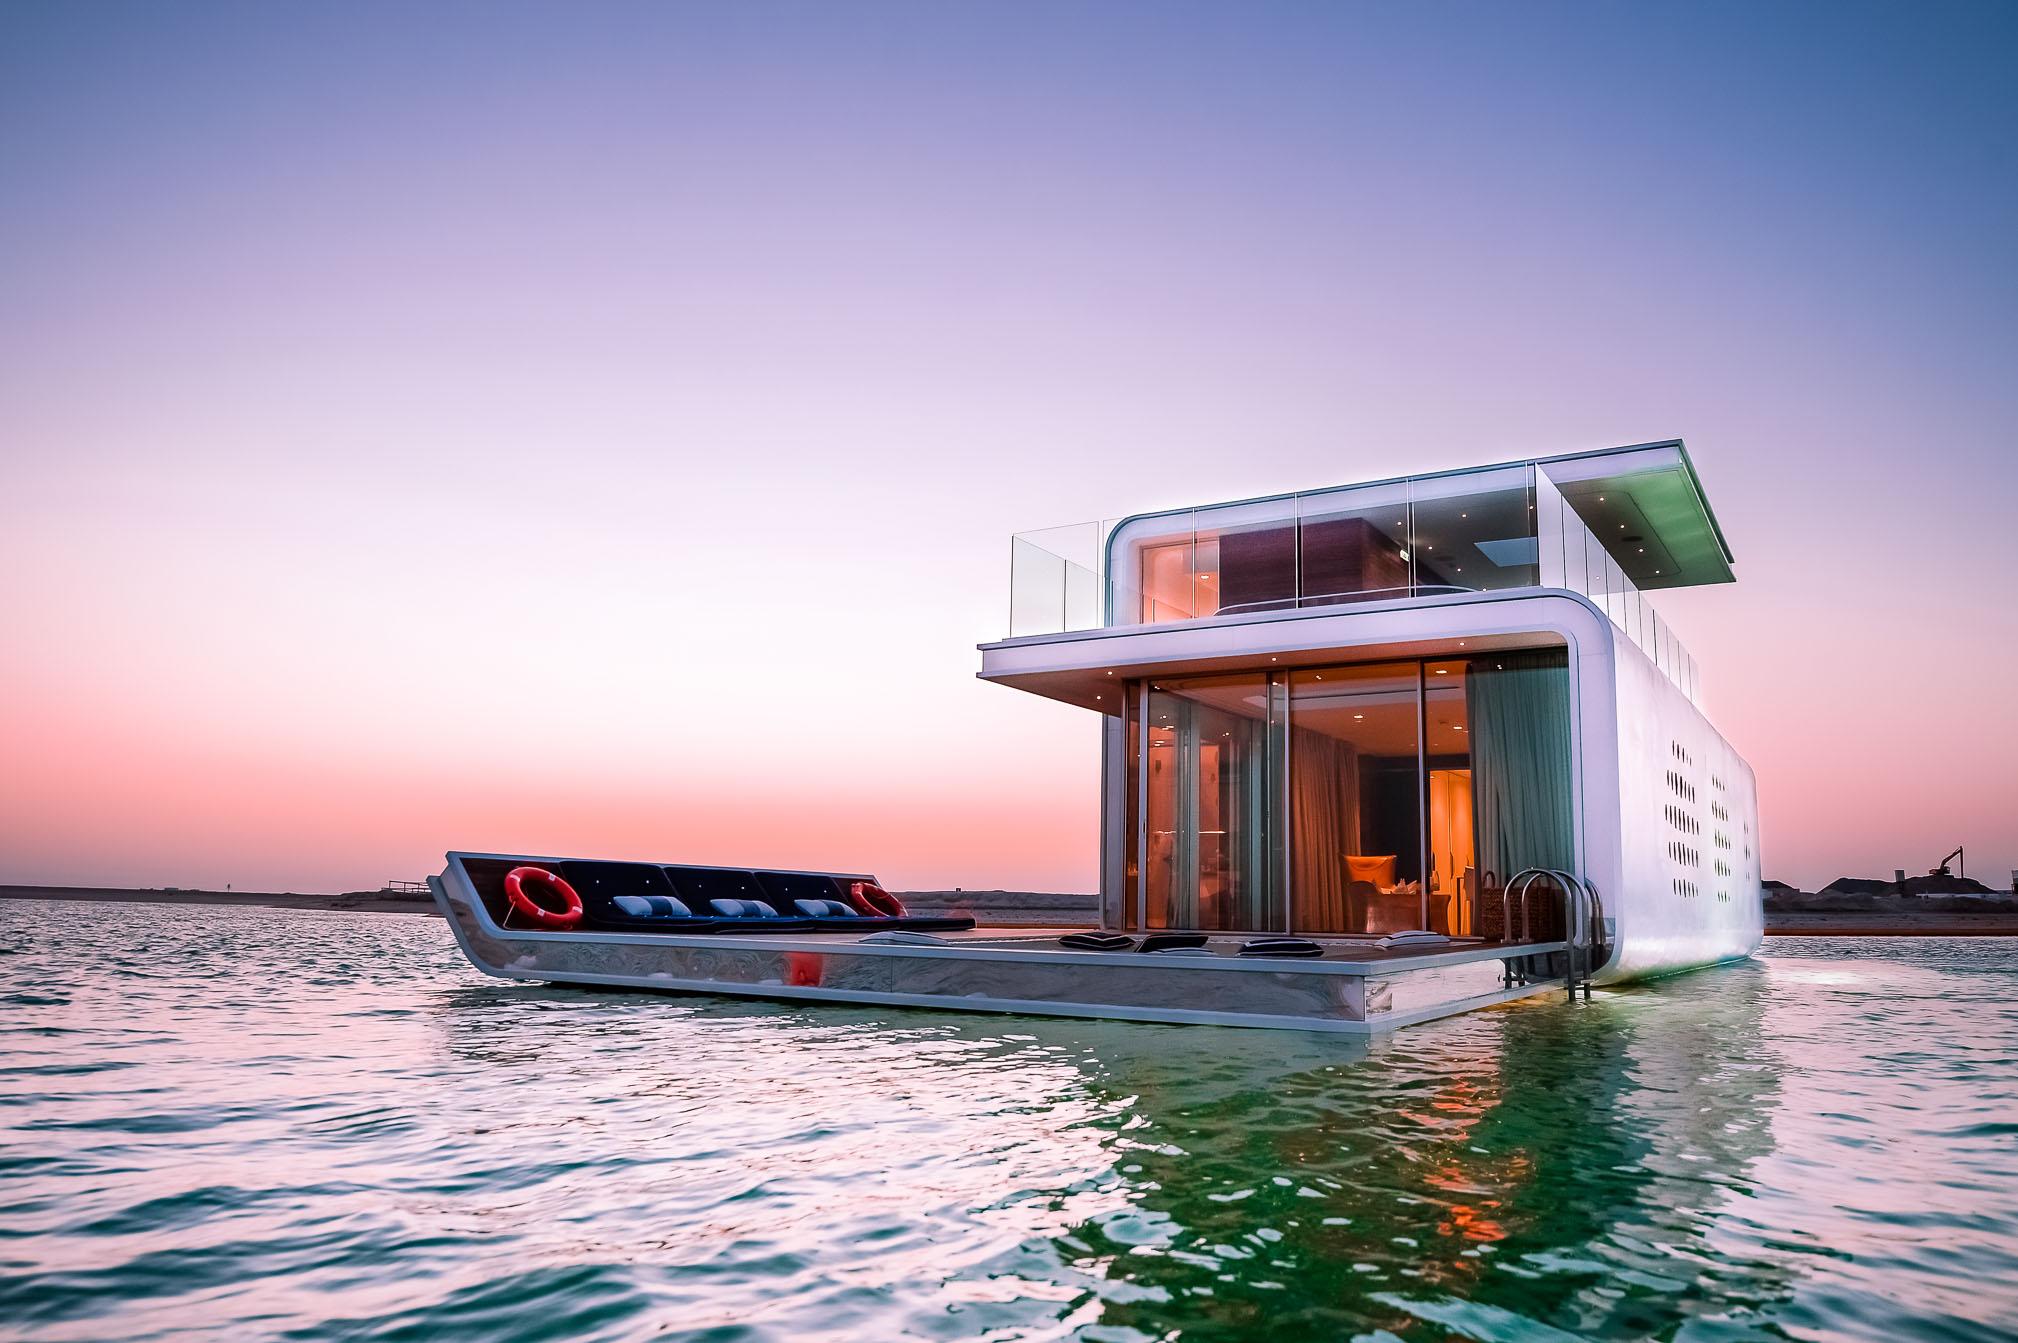 Sea Horses Dubai world Island, photography of house, architecture, photographie de maison flottante, photographe Dubai, Dubai photographer,